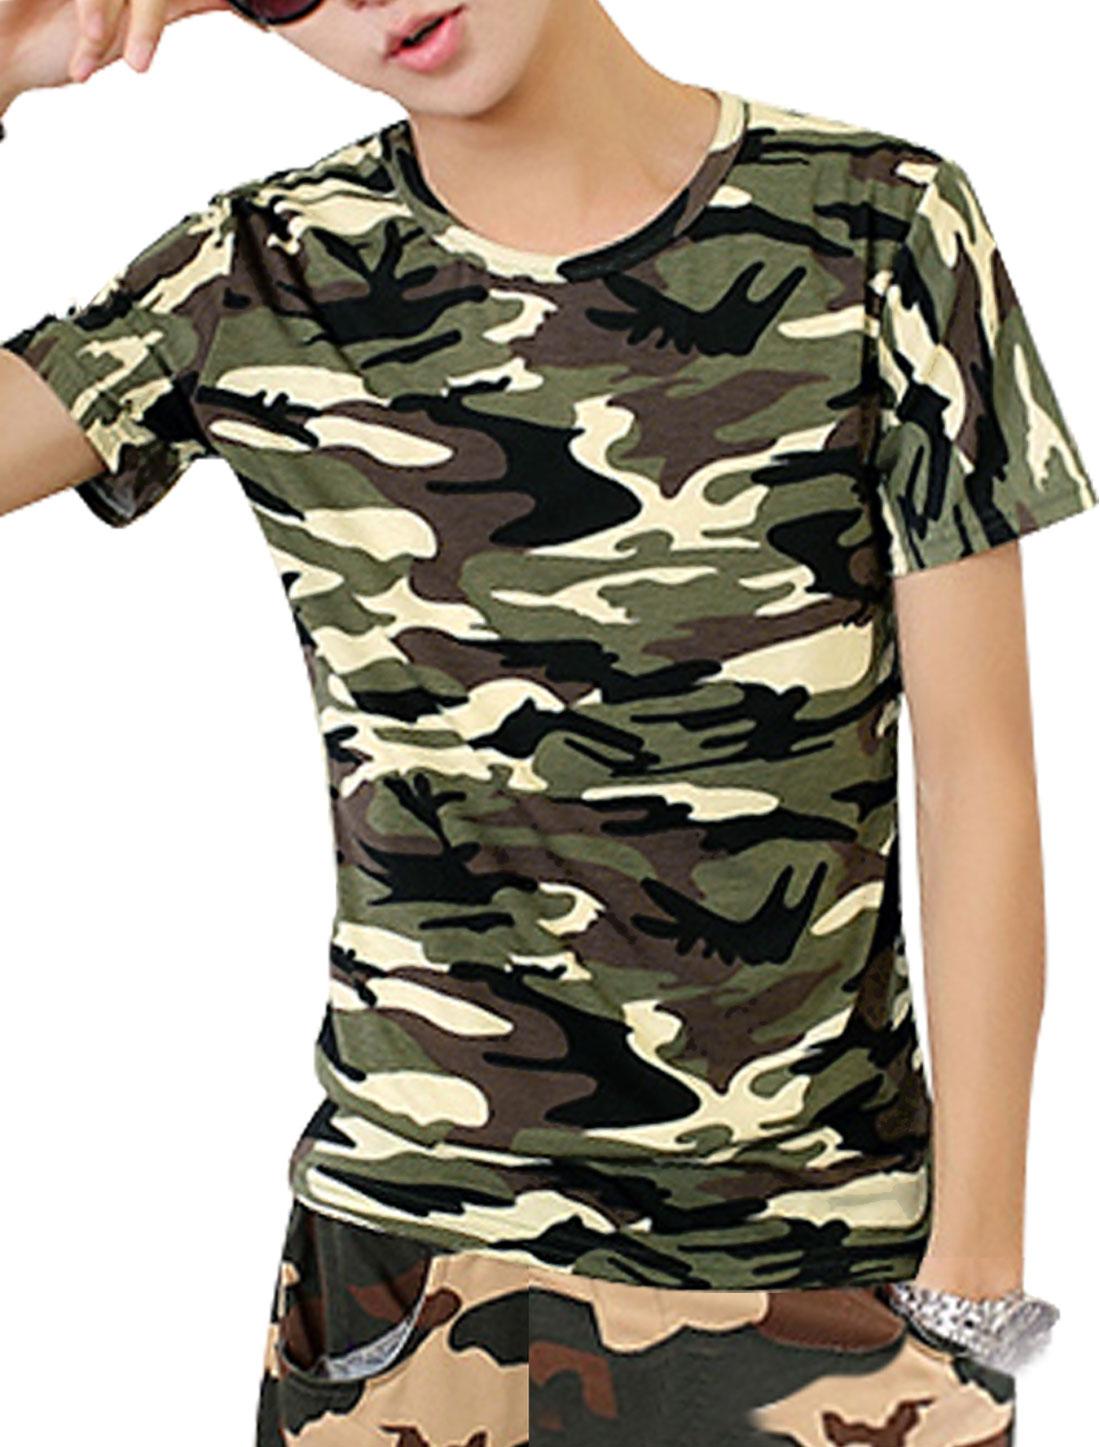 Men Cozy Fit Round Neck Camouflage Pattern Tee Top Beige Brown S